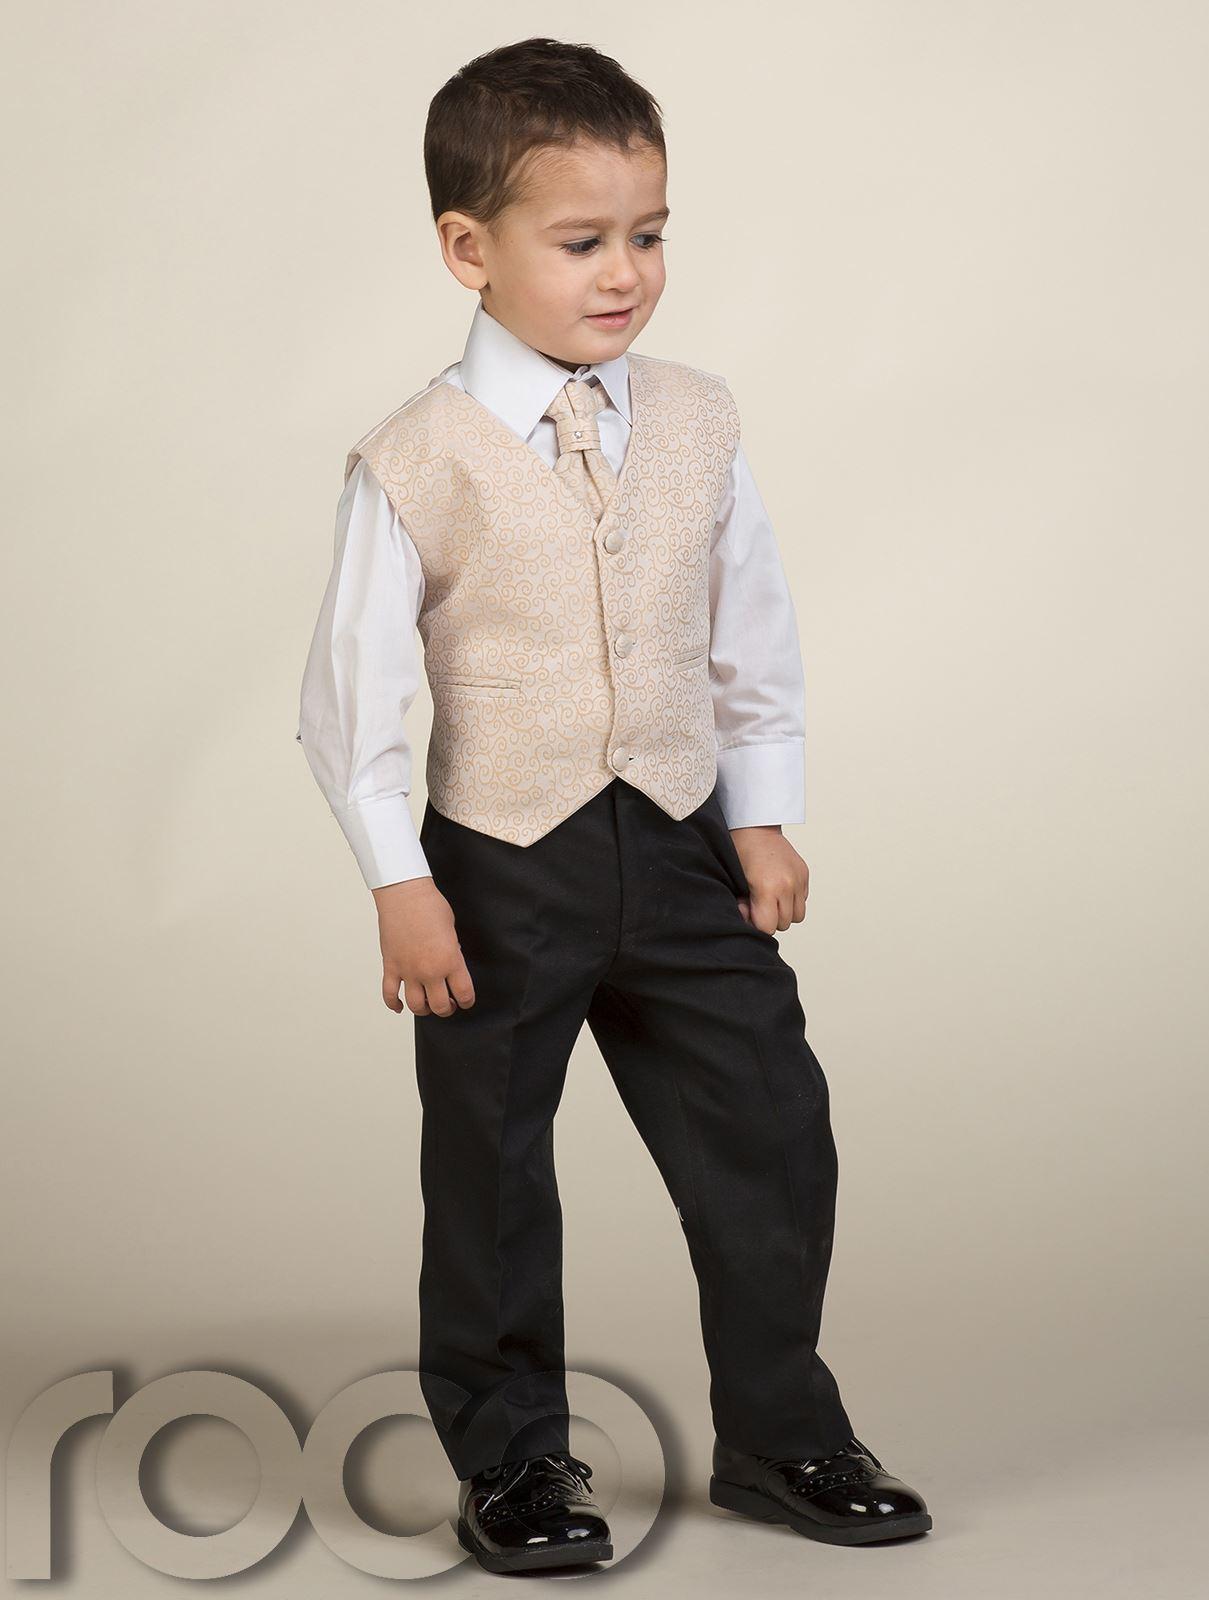 Boys Wedding Suits: Color Choices – Carey Fashion